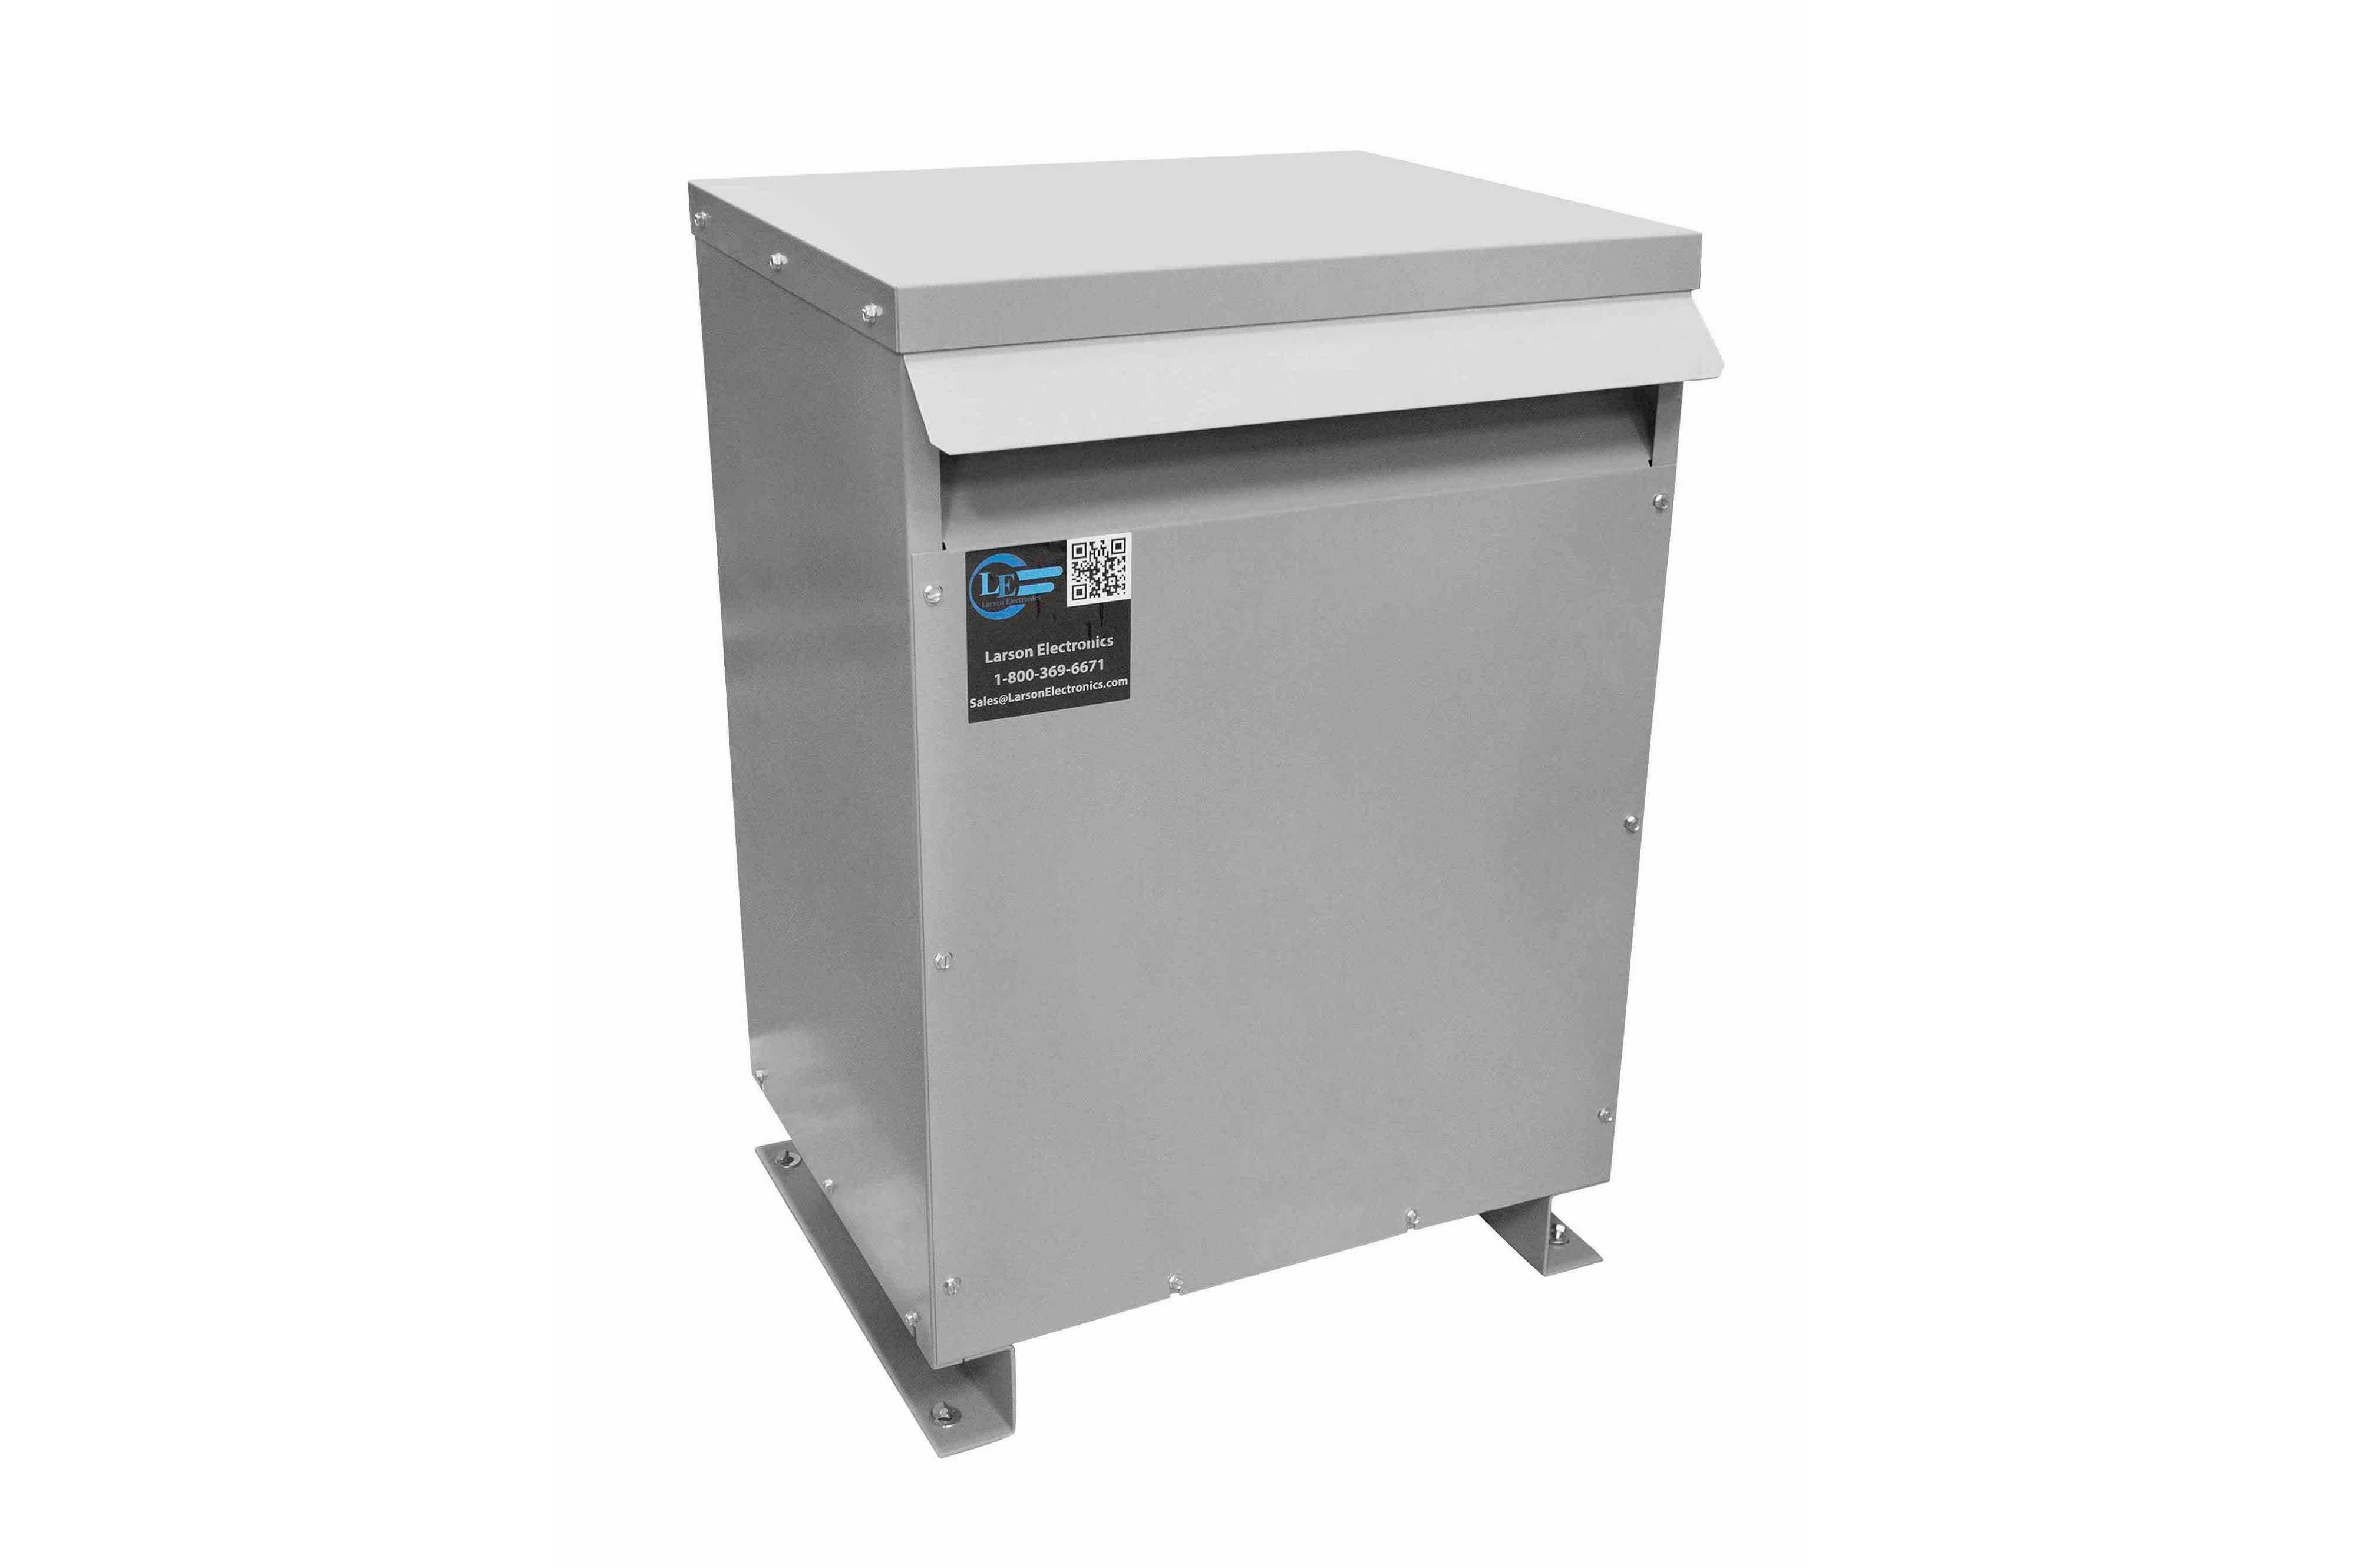 700 kVA 3PH Isolation Transformer, 415V Wye Primary, 480Y/277 Wye-N Secondary, N3R, Ventilated, 60 Hz